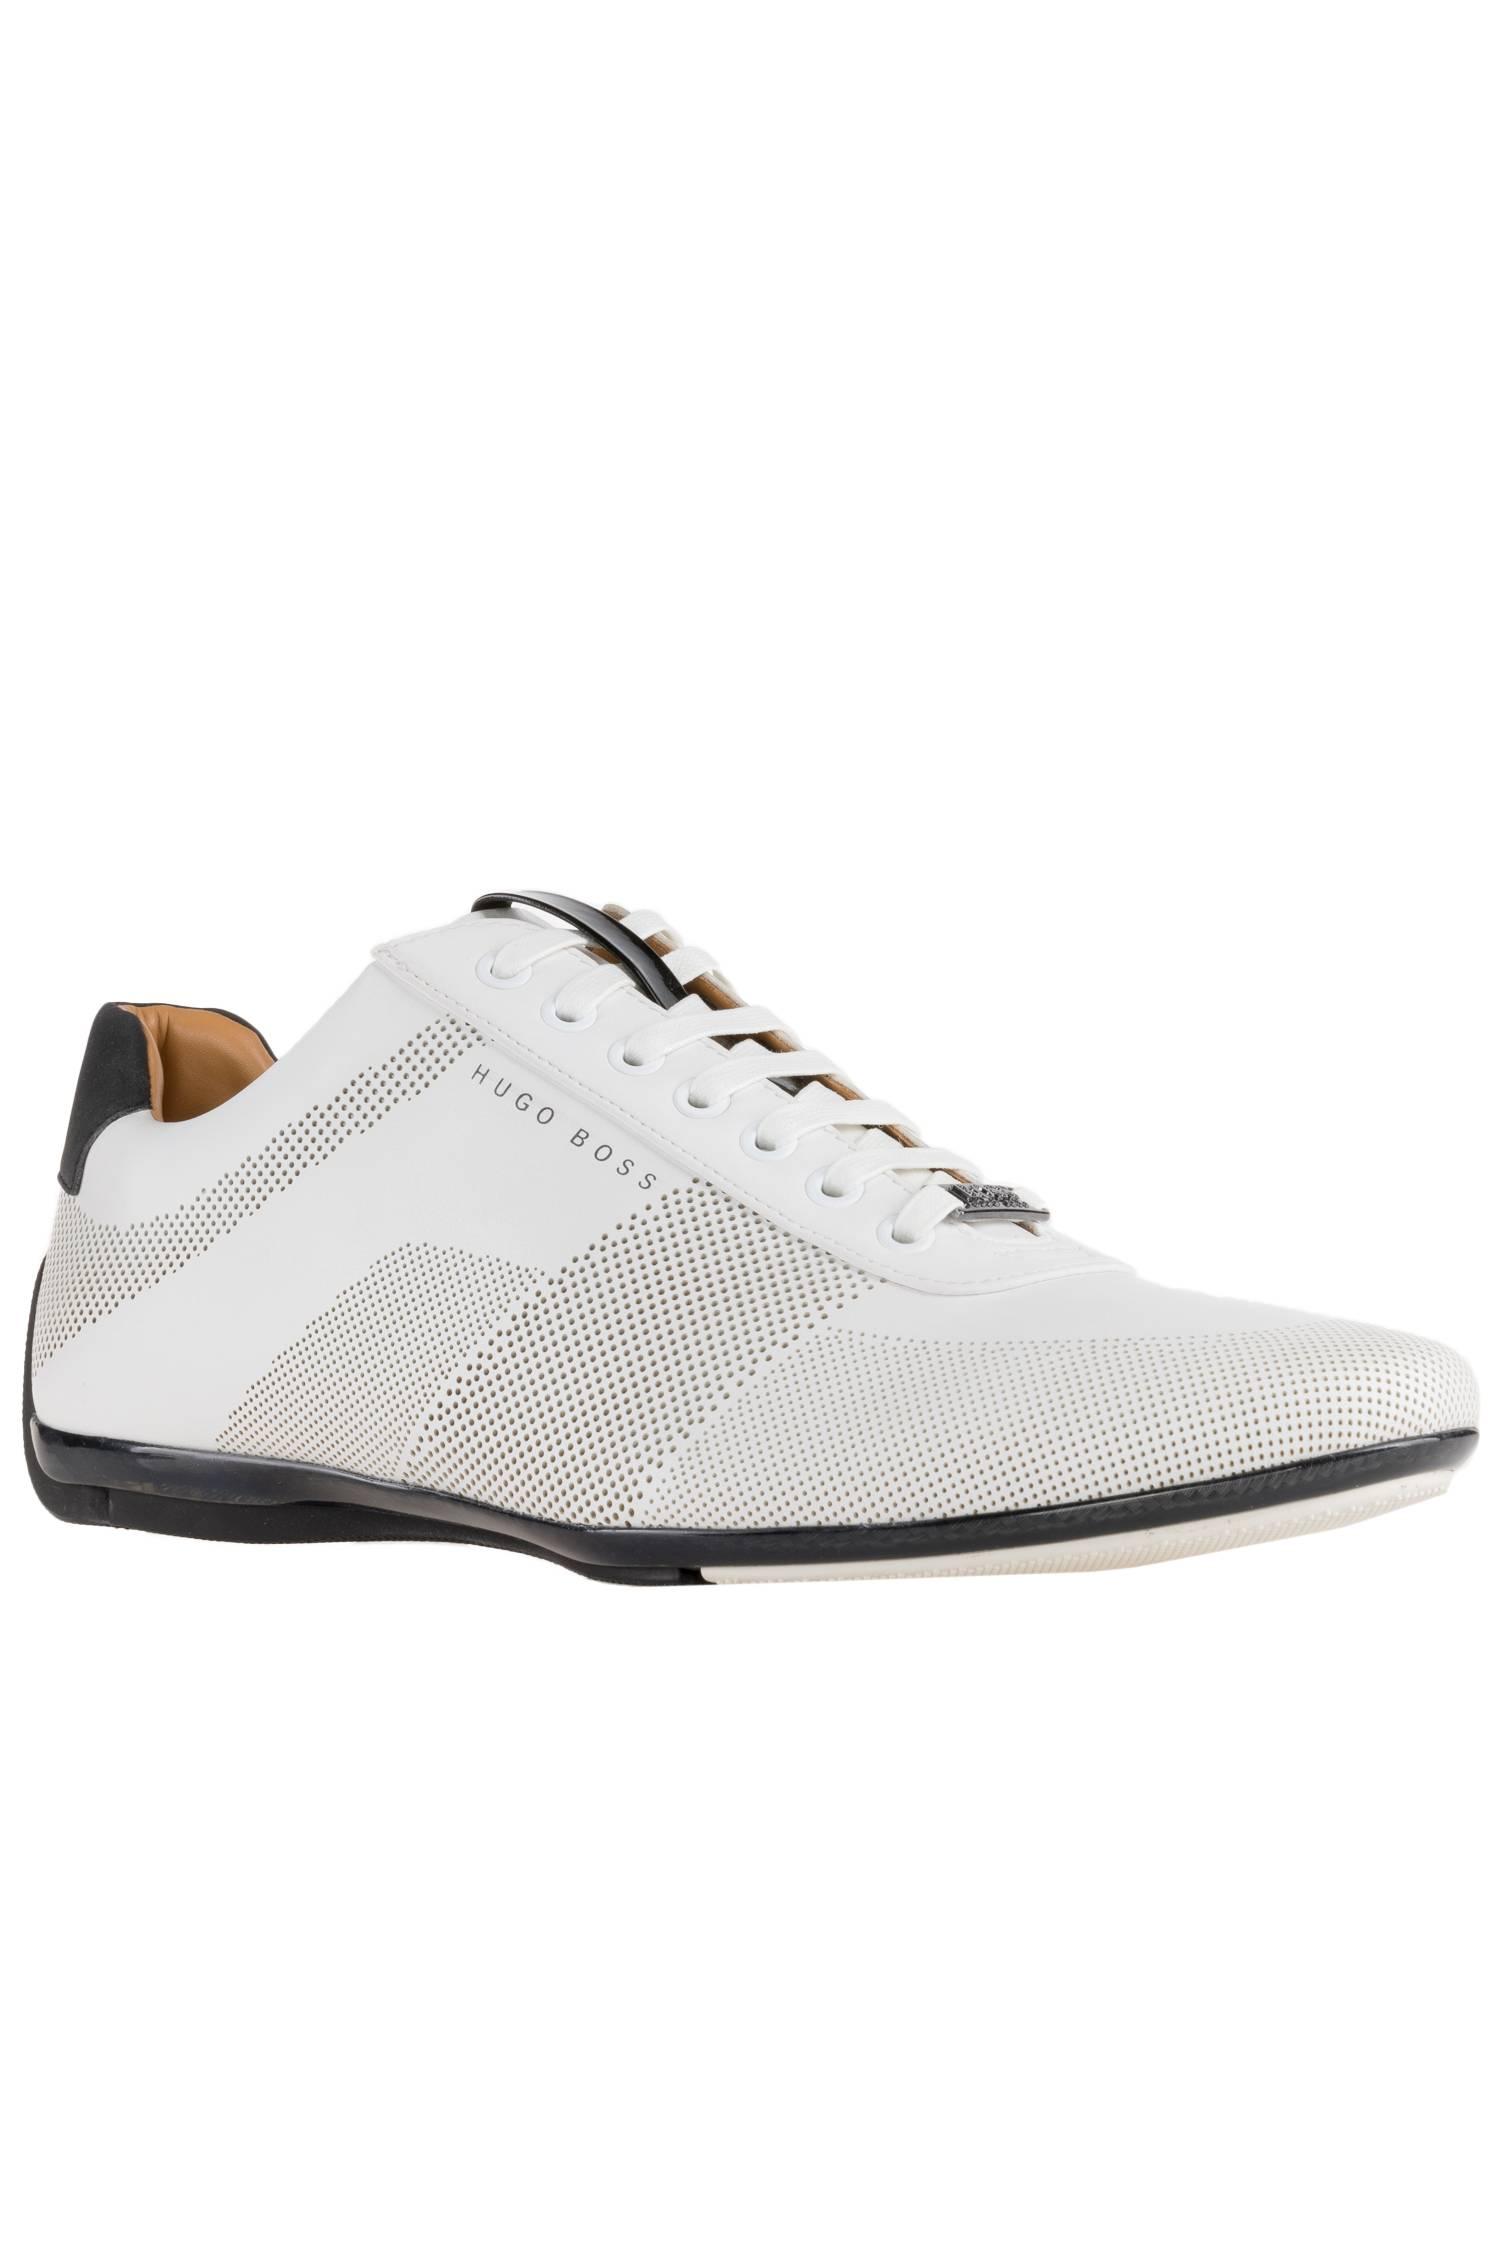 08974fa2f25 ... Mens Nike Zoom SPRDN 11 11 11 Metallic Silver Black Red White Running  Shoes 876267- ...